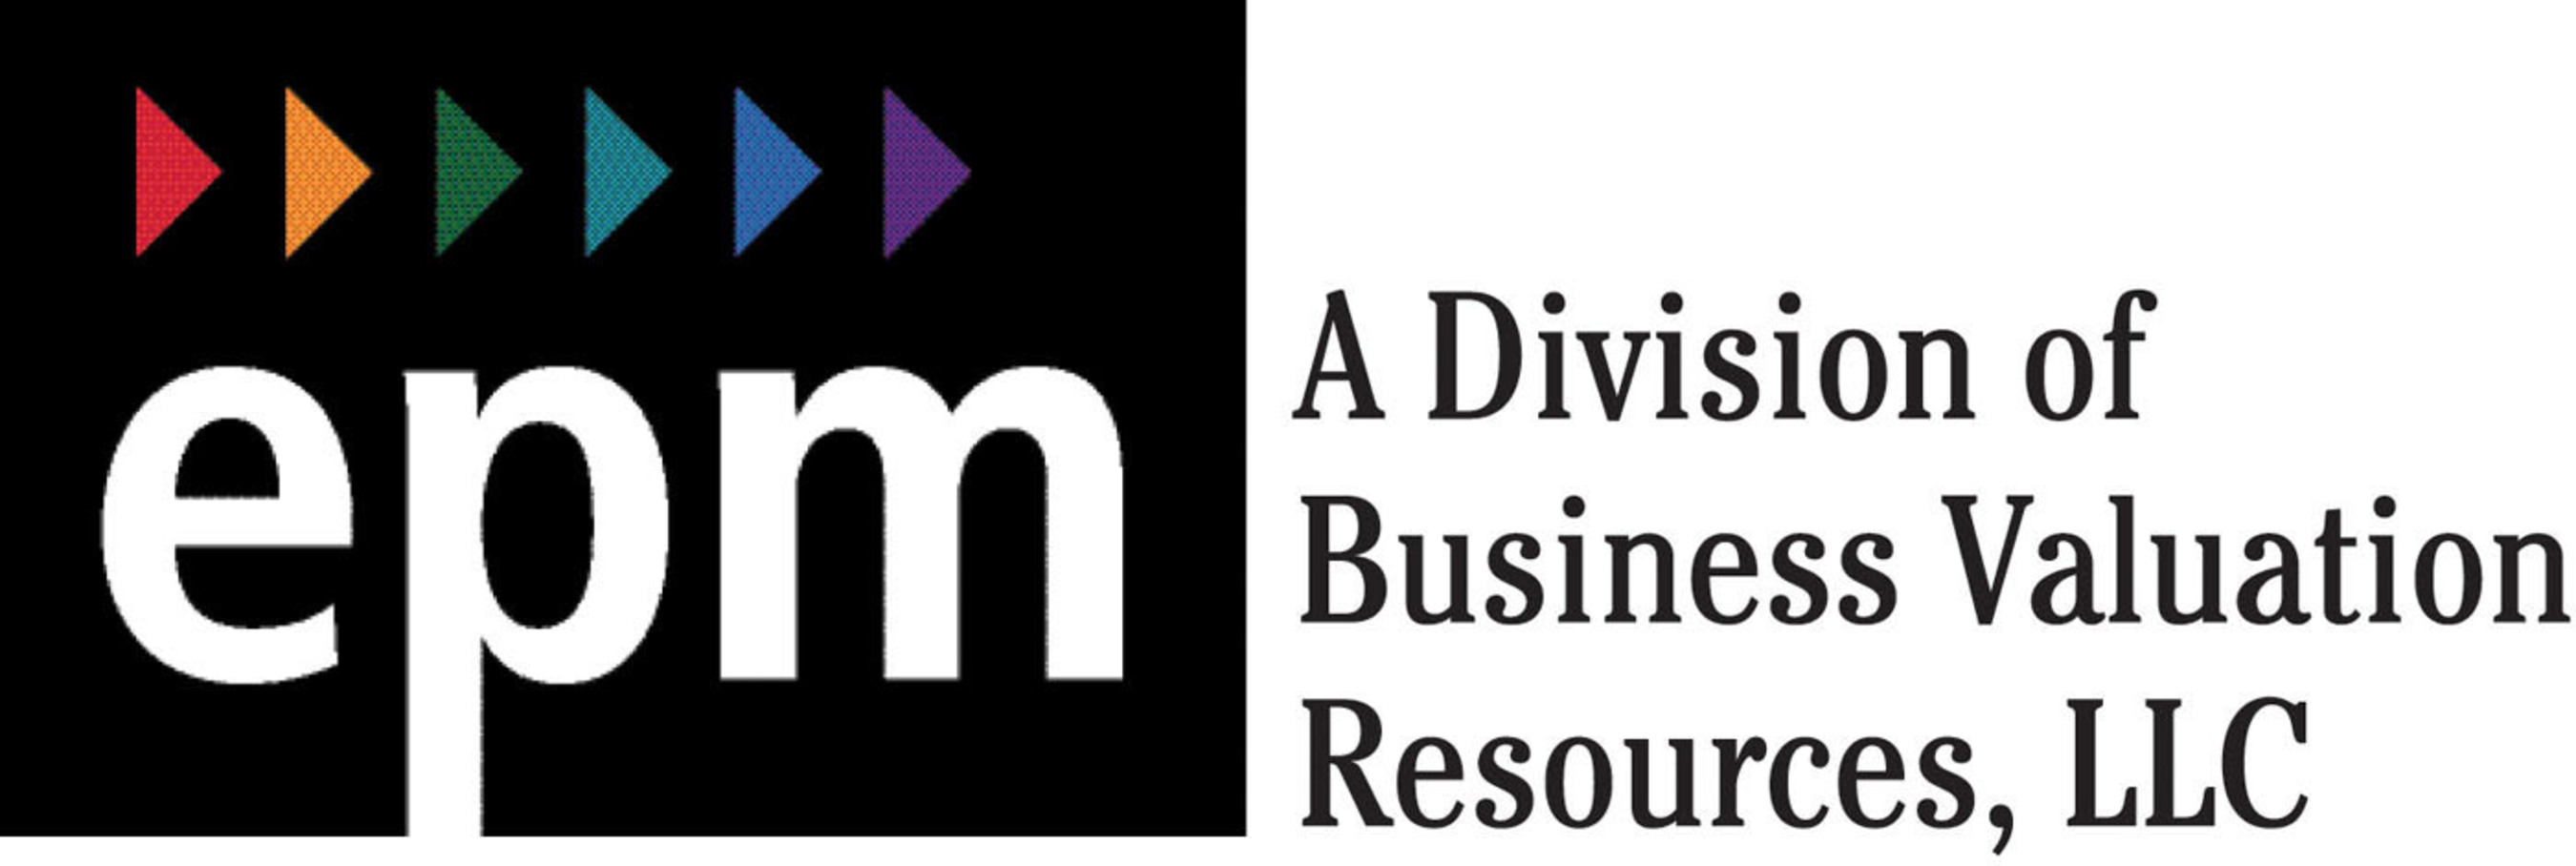 EPM - A Division of Business Valuation Resources, LLC. (PRNewsFoto/BVR) (PRNewsFoto/BVR)